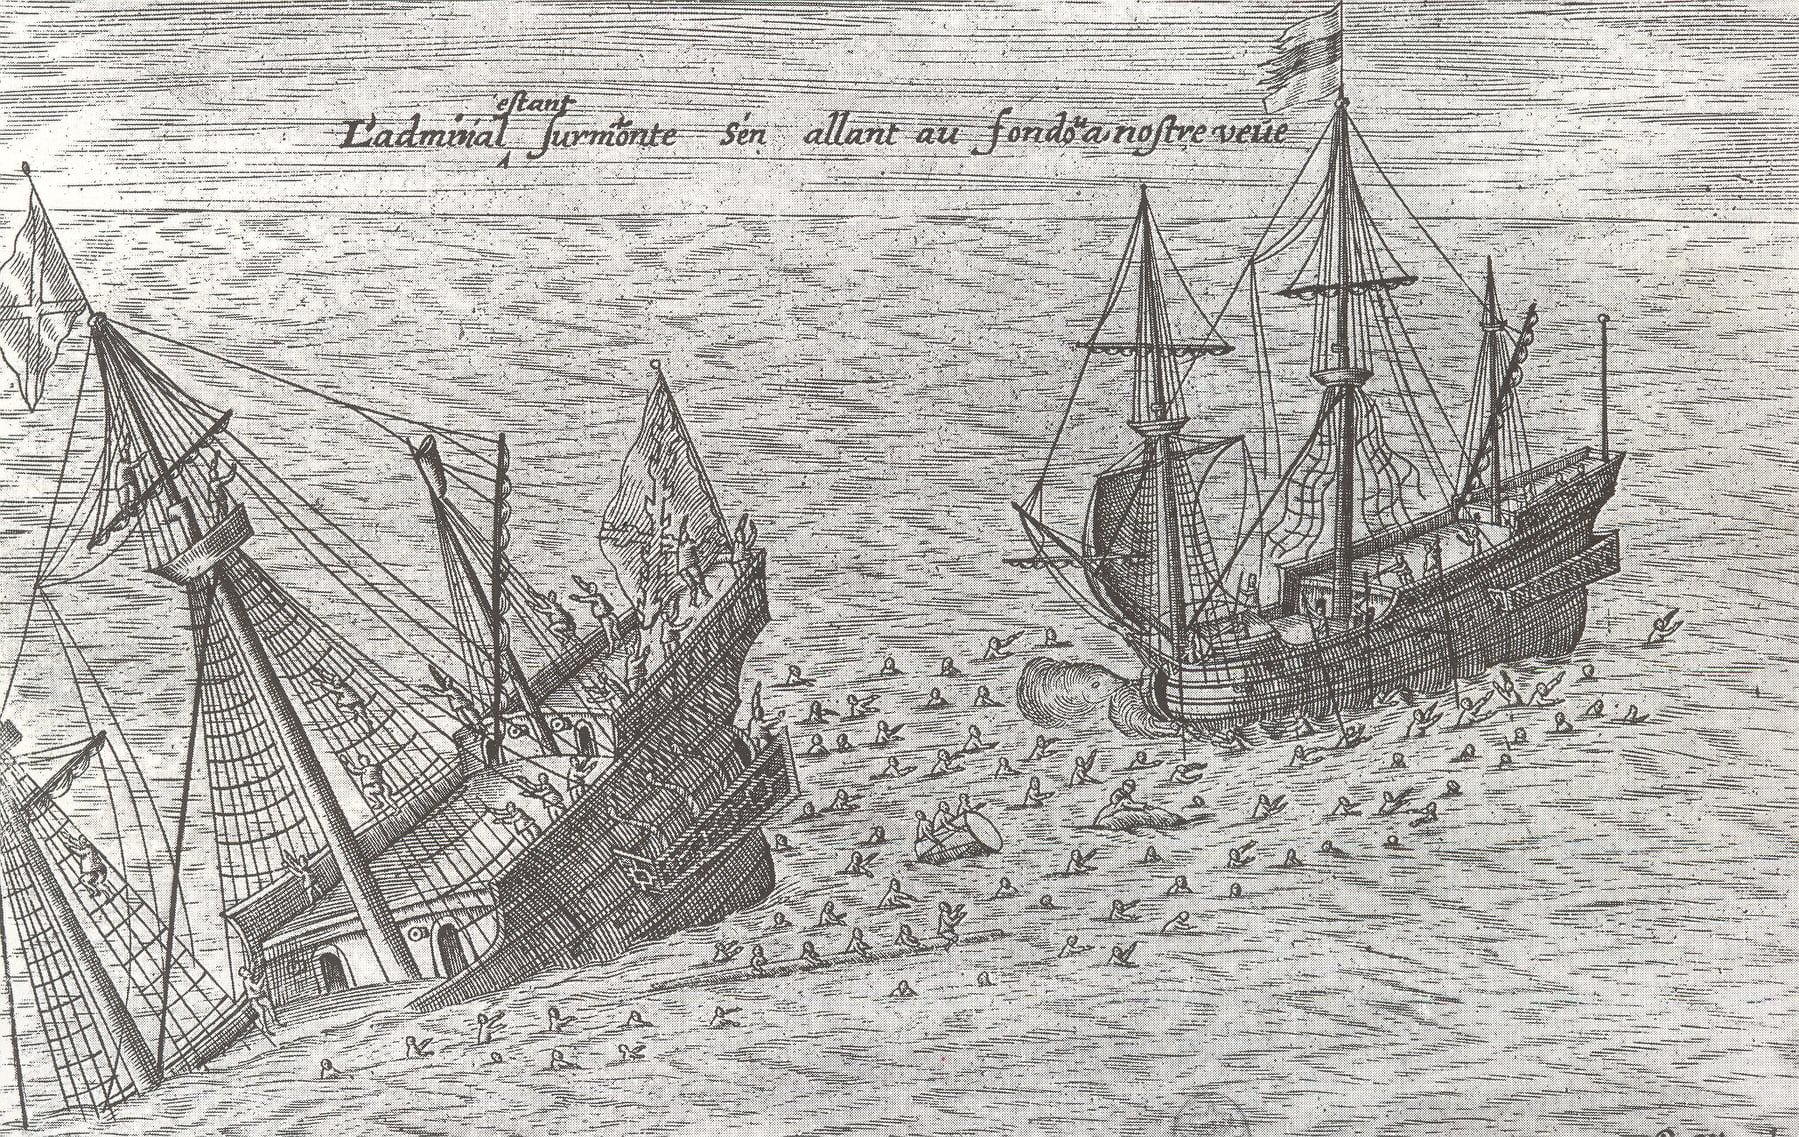 San Diego Shipwreck Near Fortune Island in Batangas, Philippines [Amazing Archeology]